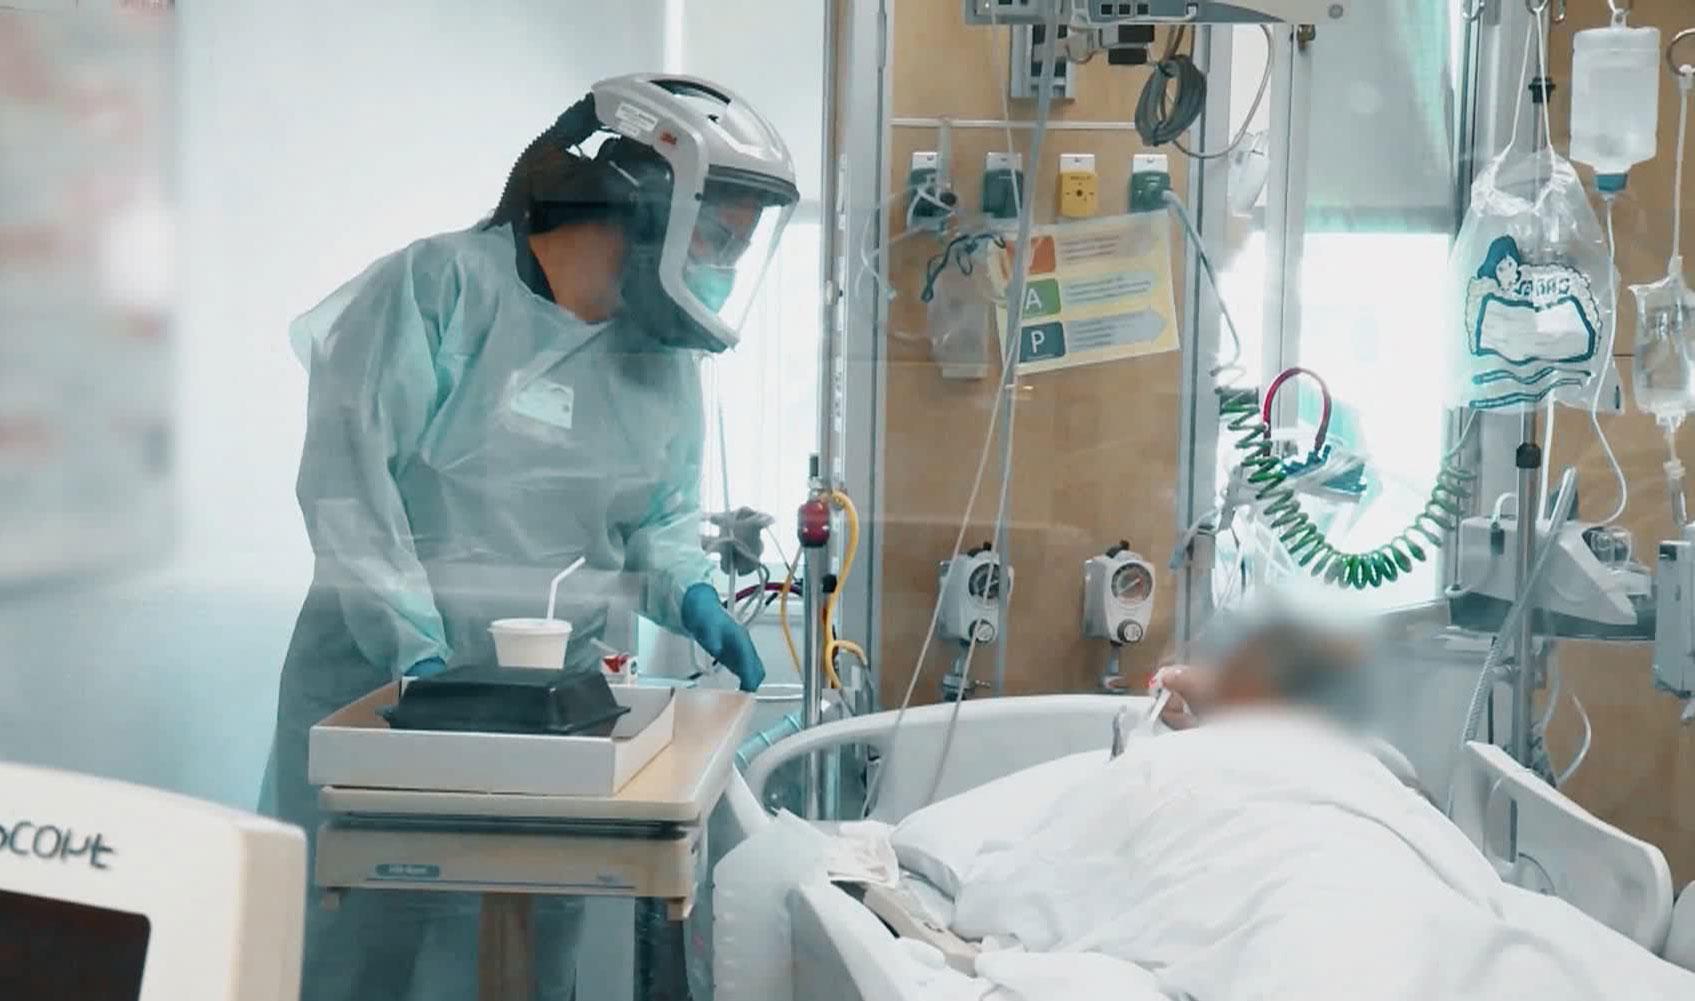 A nurse attends to a coronavirus patient at El Centro Regional Medical Center in El Centro, California.